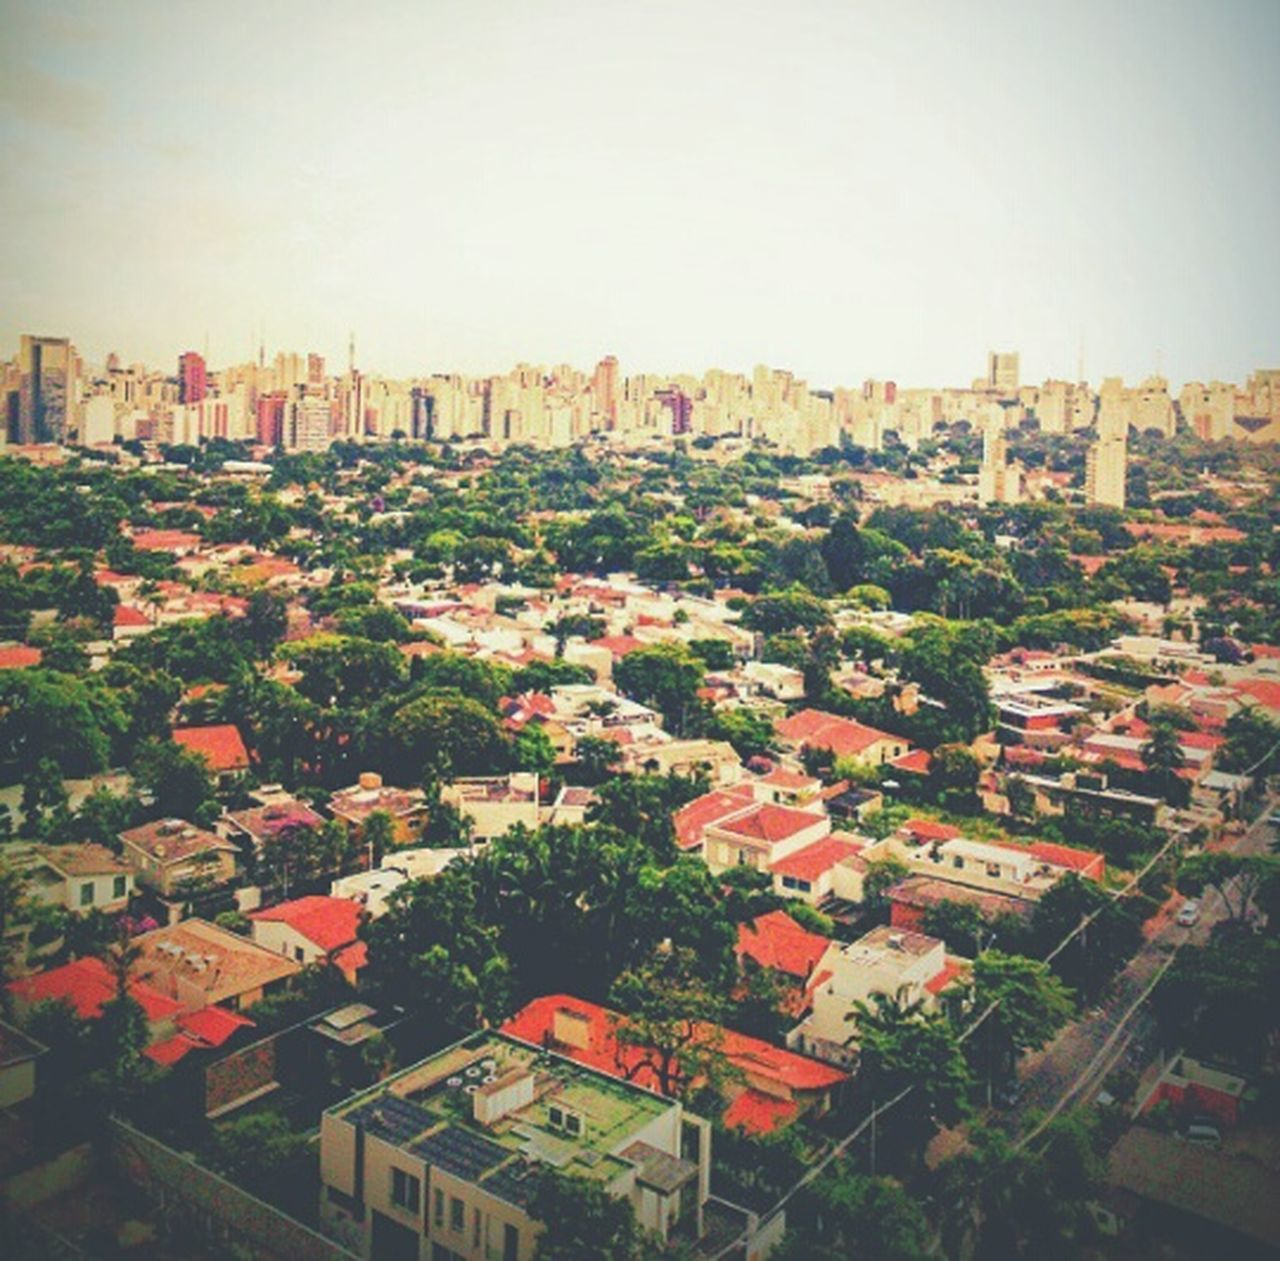 View View From The Window... Meeting Room Itaim Jardins Saopaulo Sao Paulo - Brazil